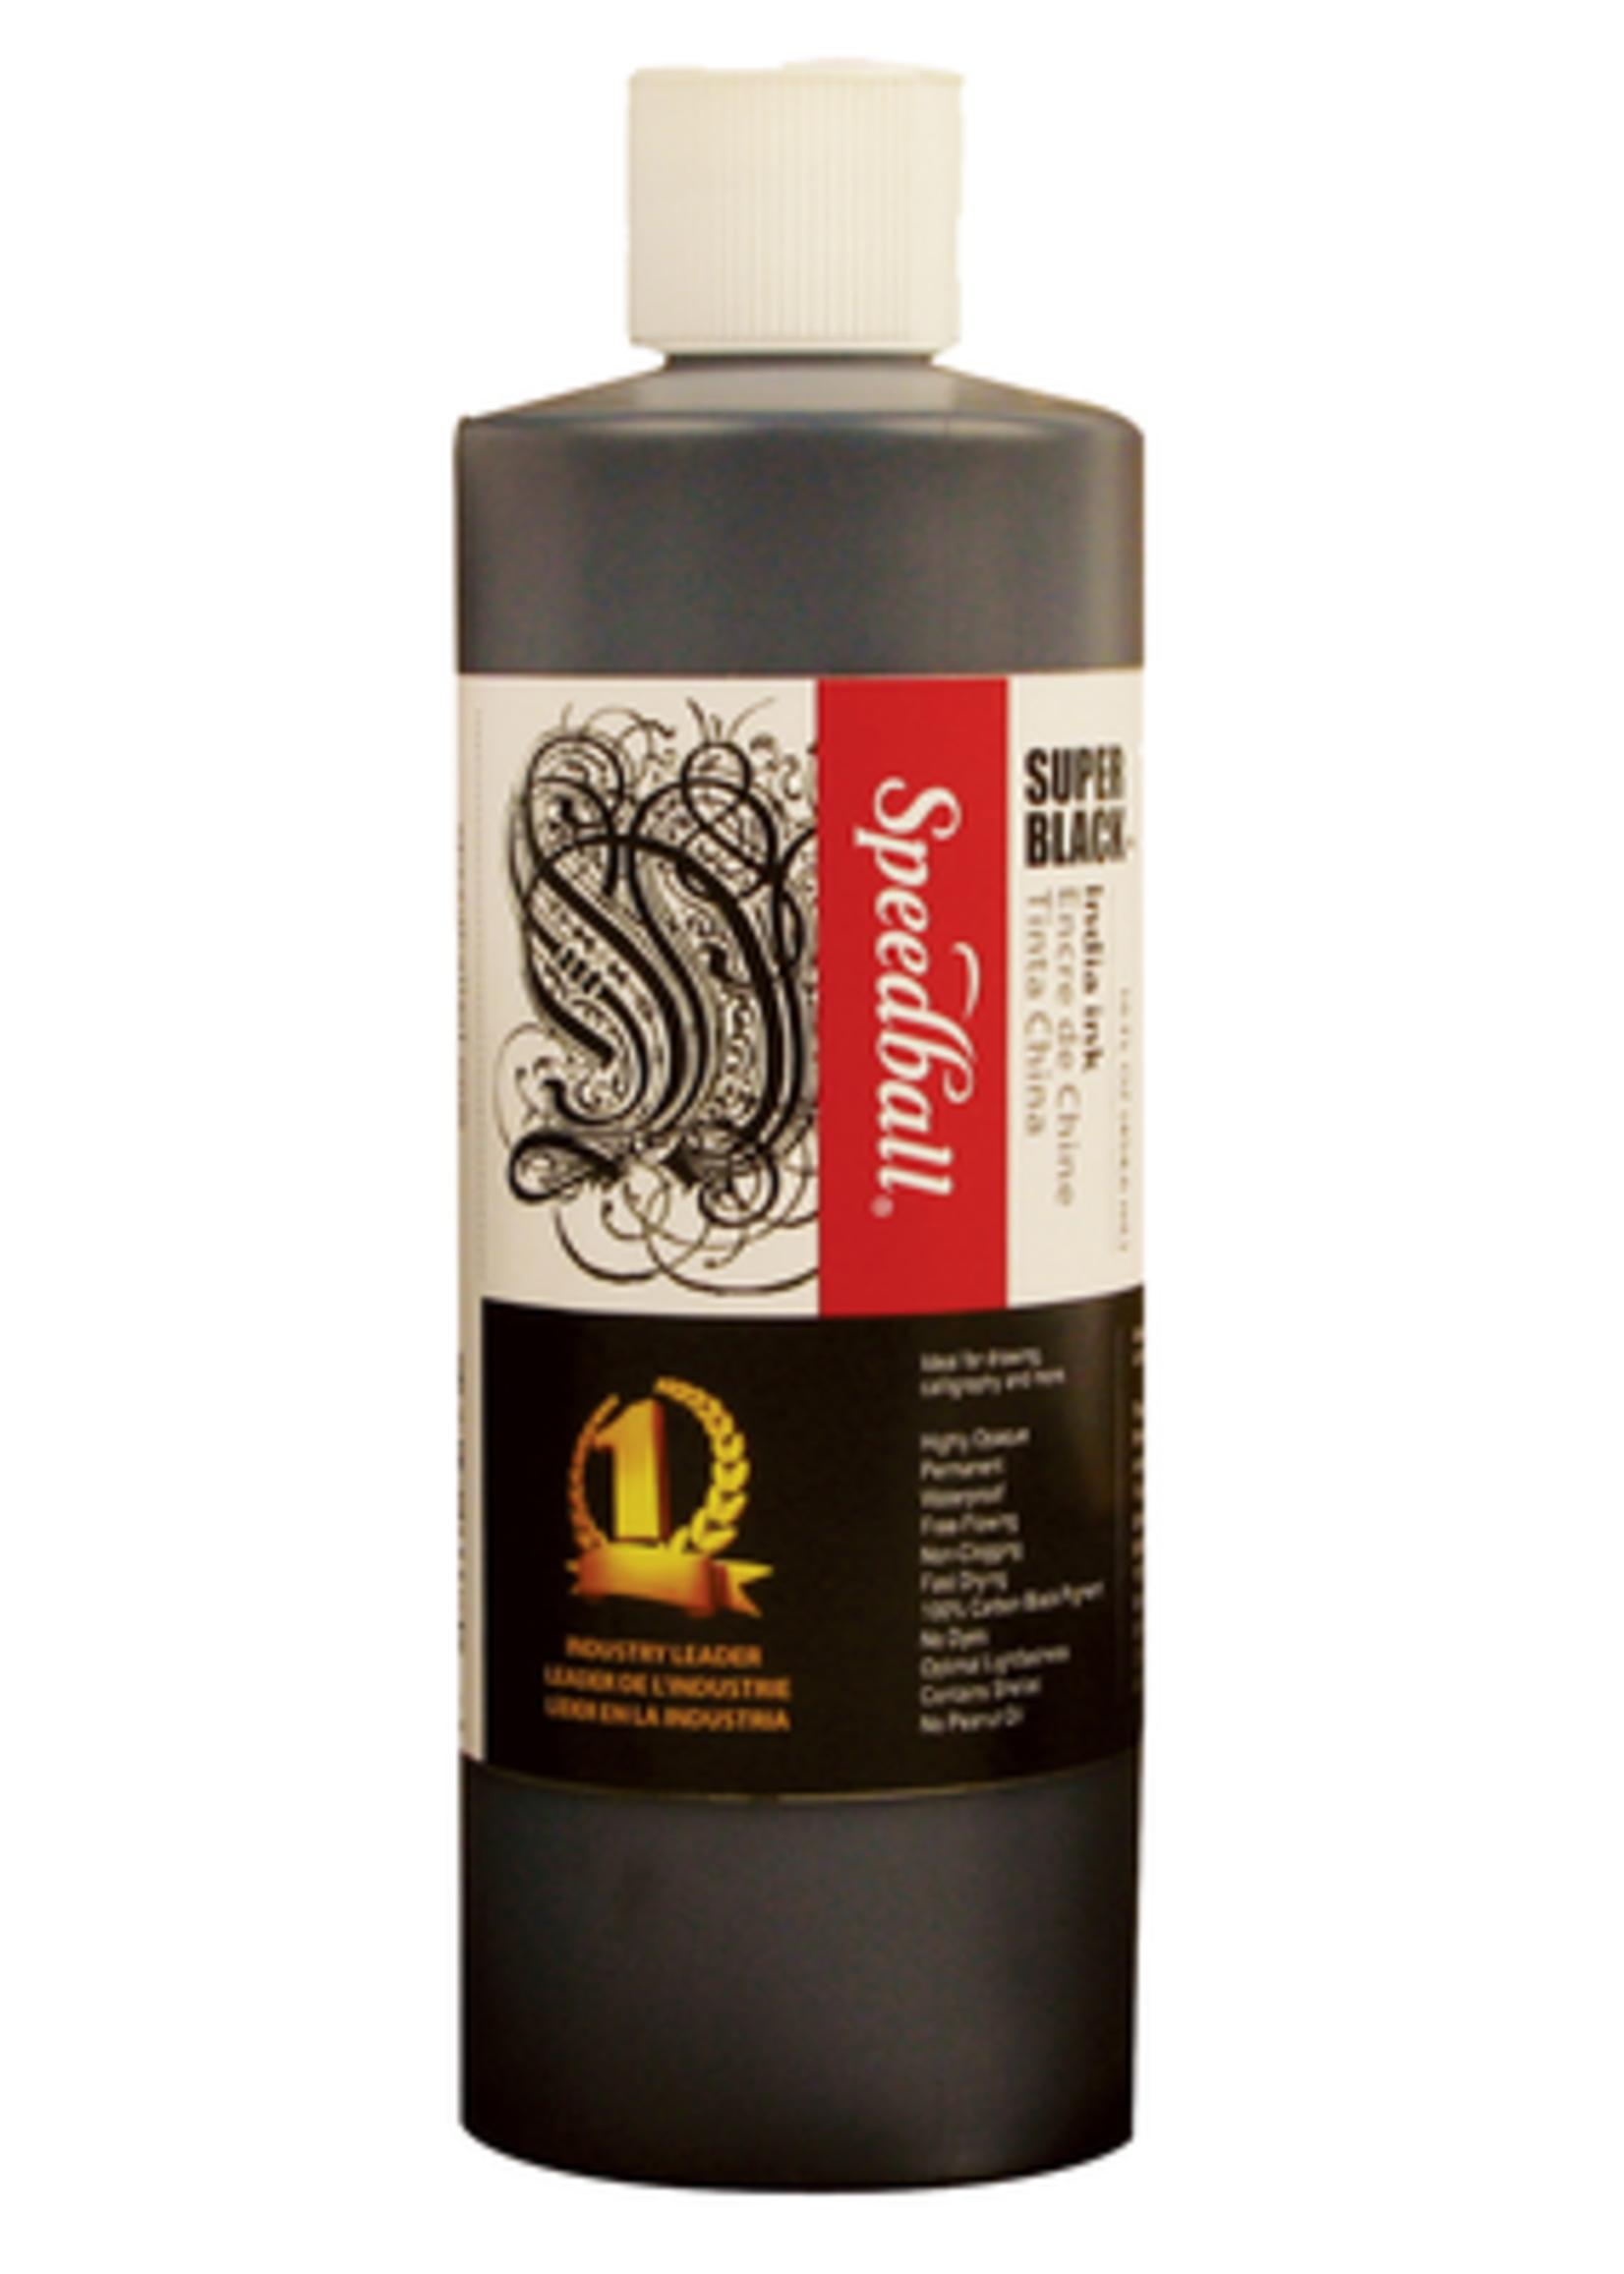 SPEEDBALL ART PRODUCTS SUPER BLACK INDIA INK